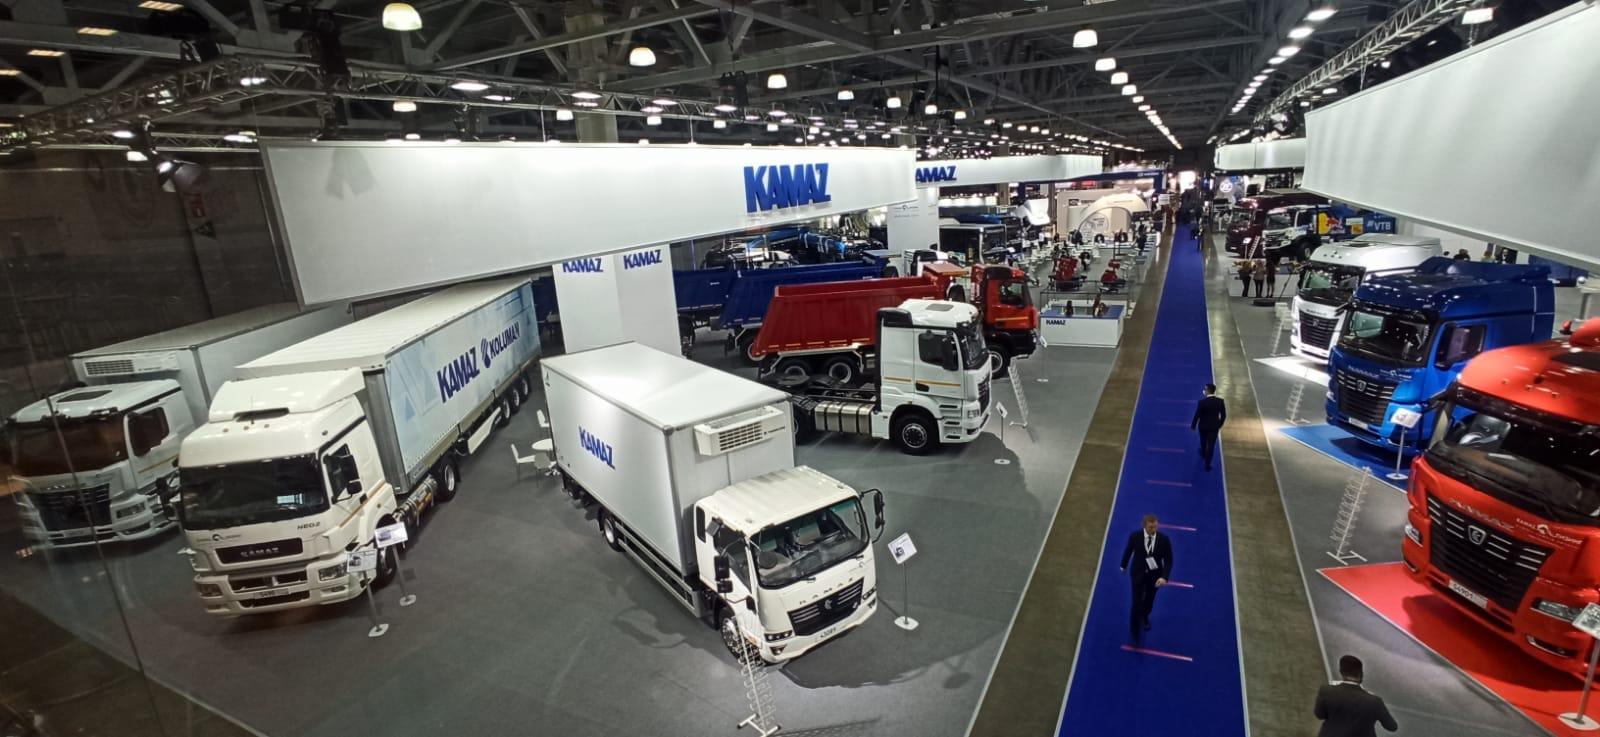 Топ-менеджеры «КАМАЗа» на выставке Comtrans-2021